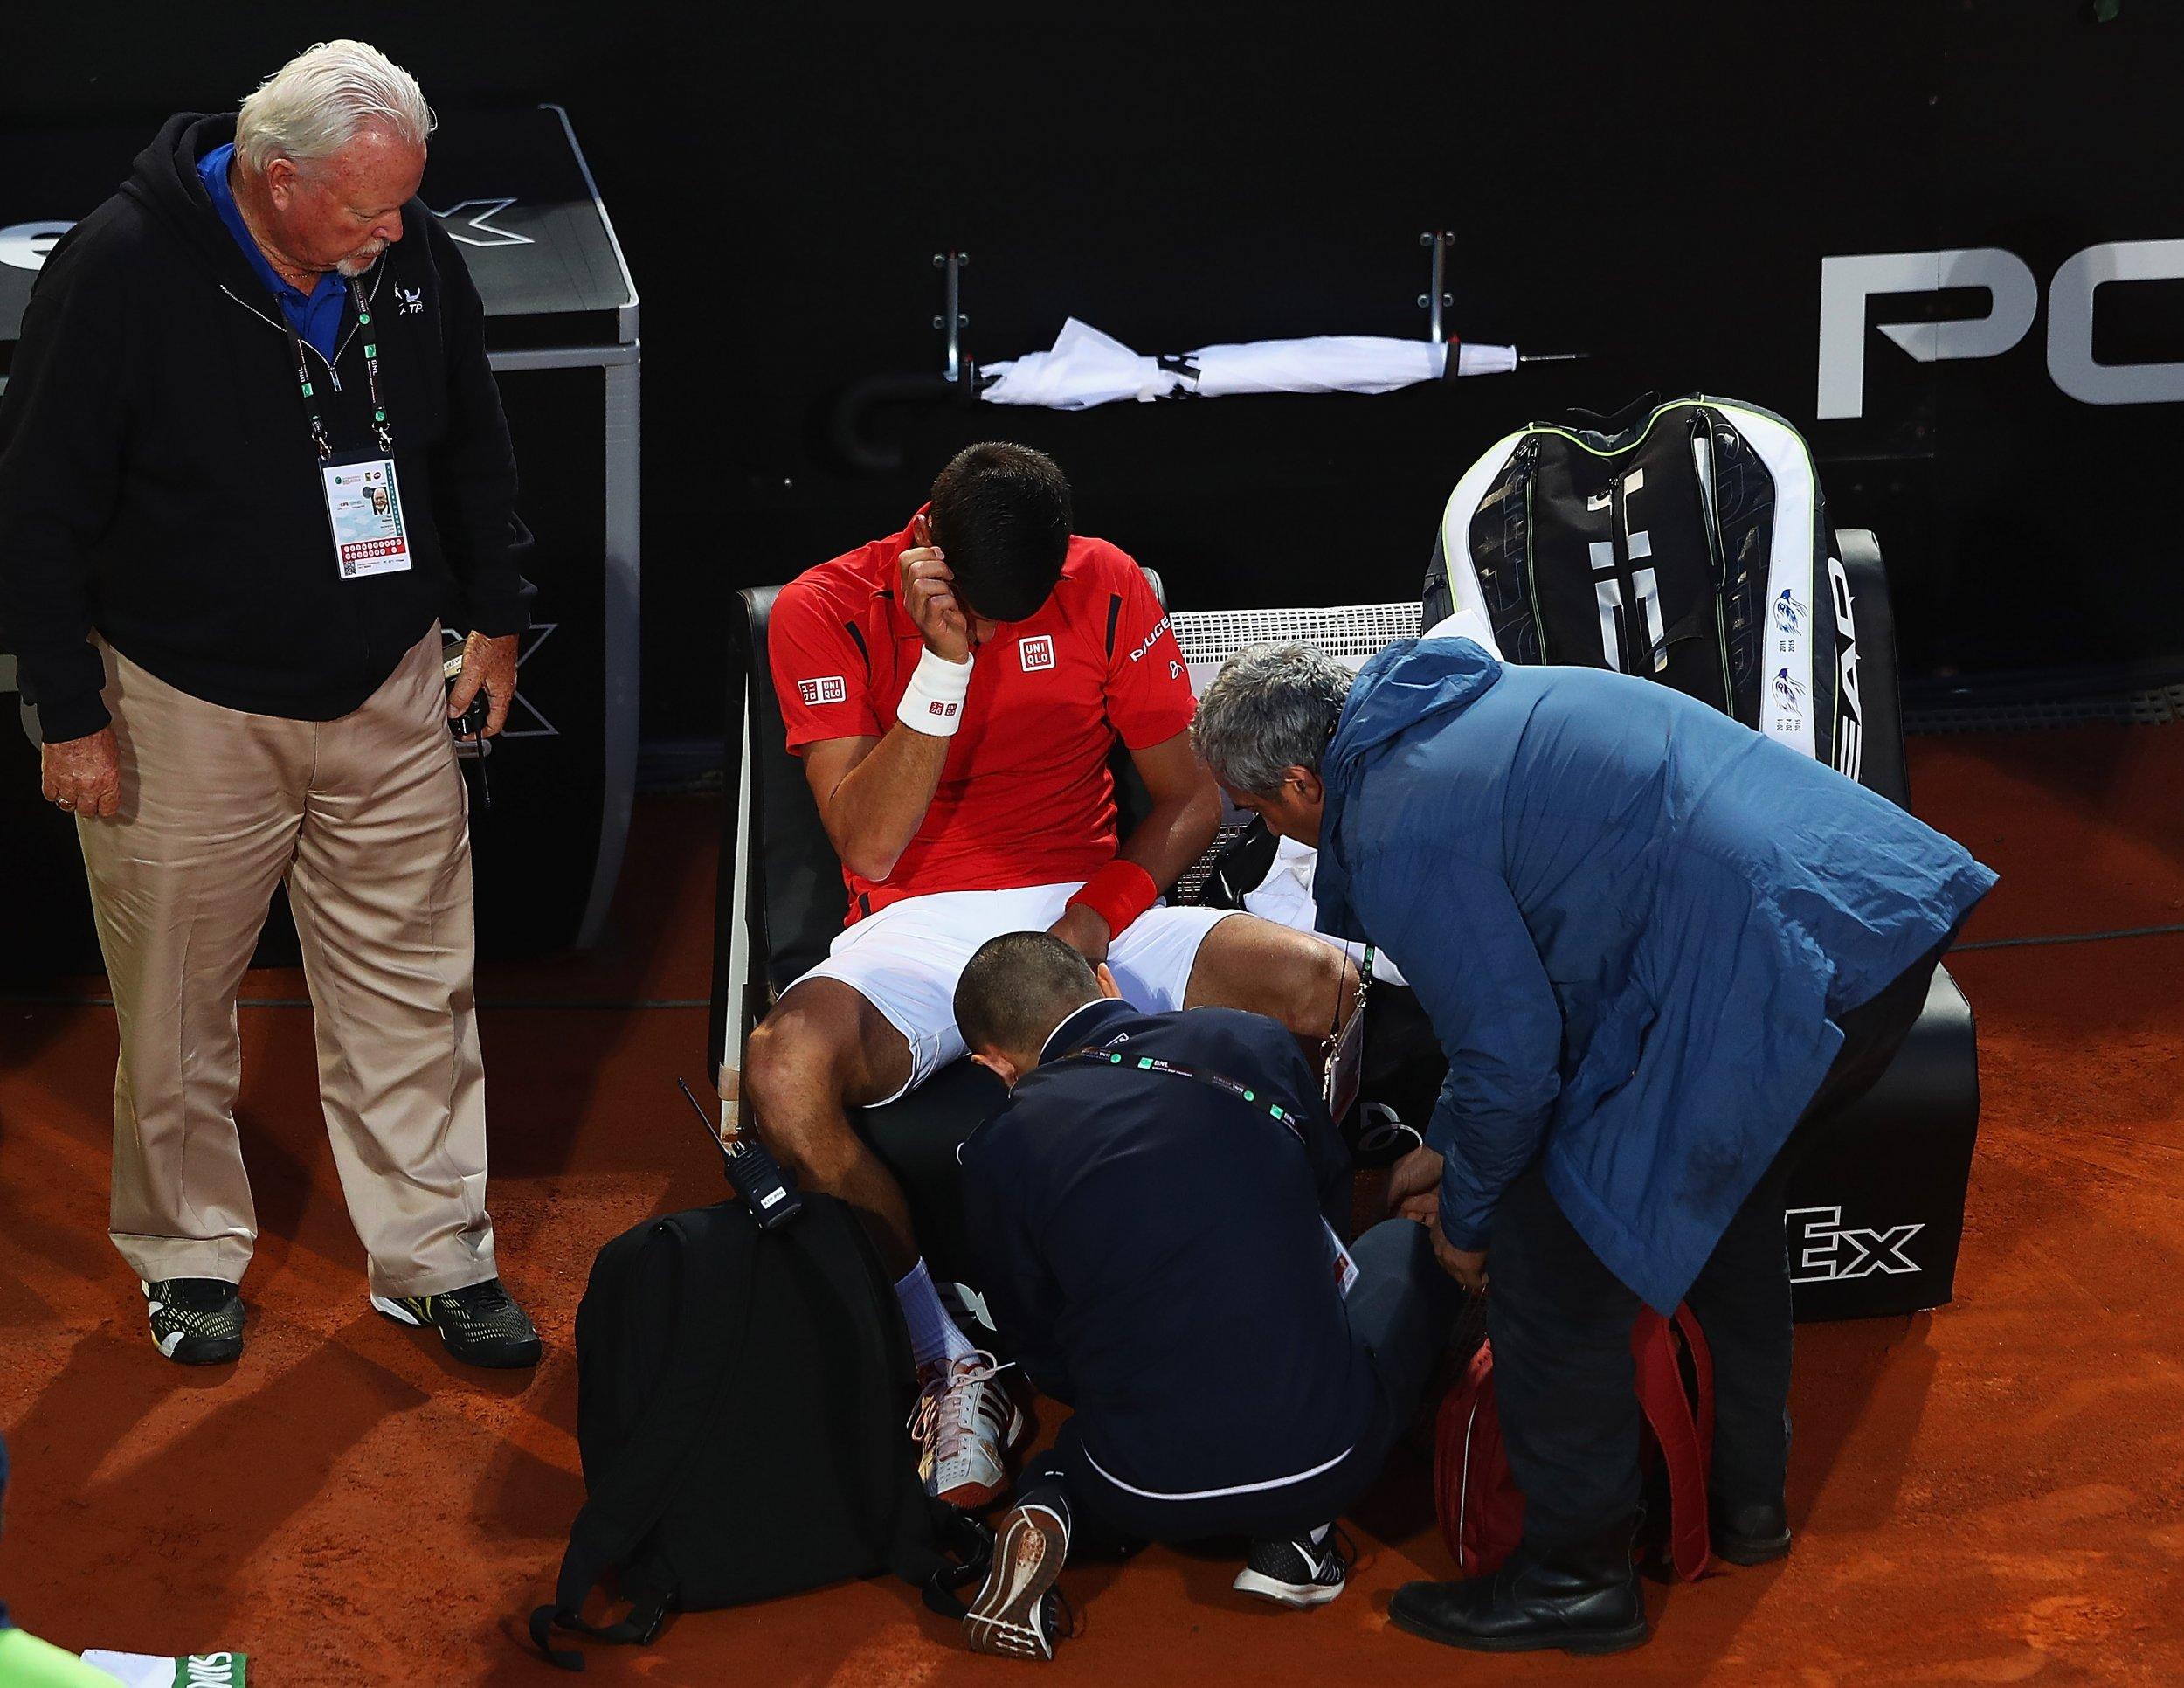 Novak Djokovic at the Italian Open final